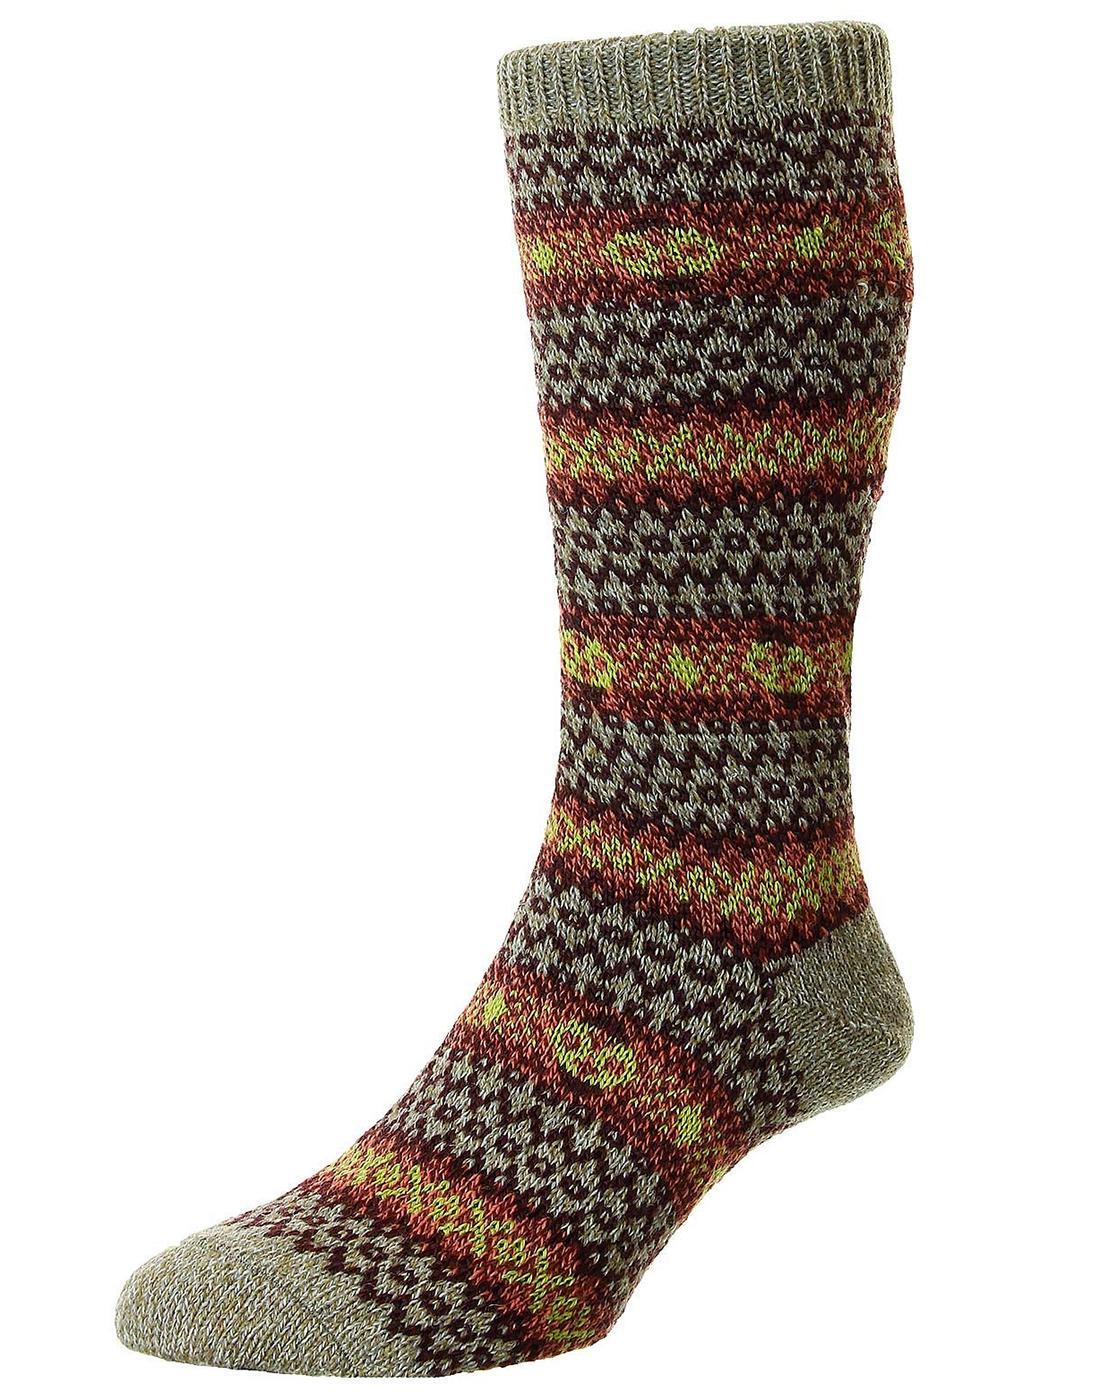 +Felbrigg SCOTT-NICHOL Country Fairisle Wool Socks